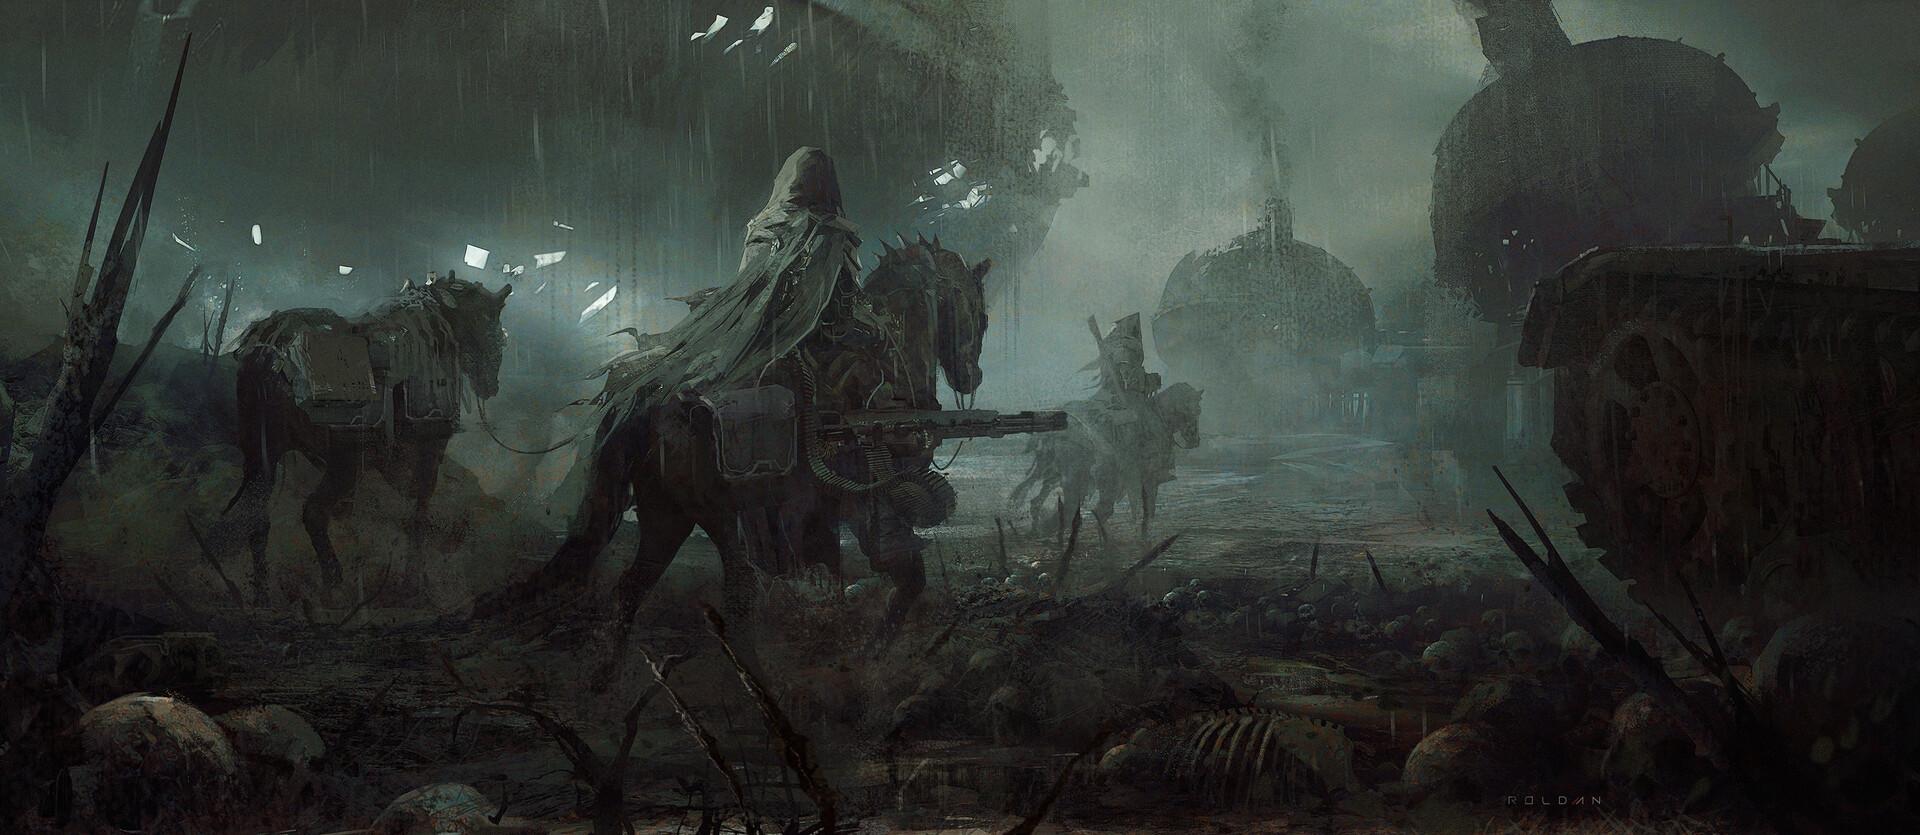 juan-pablo-roldan-wars-12.jpg